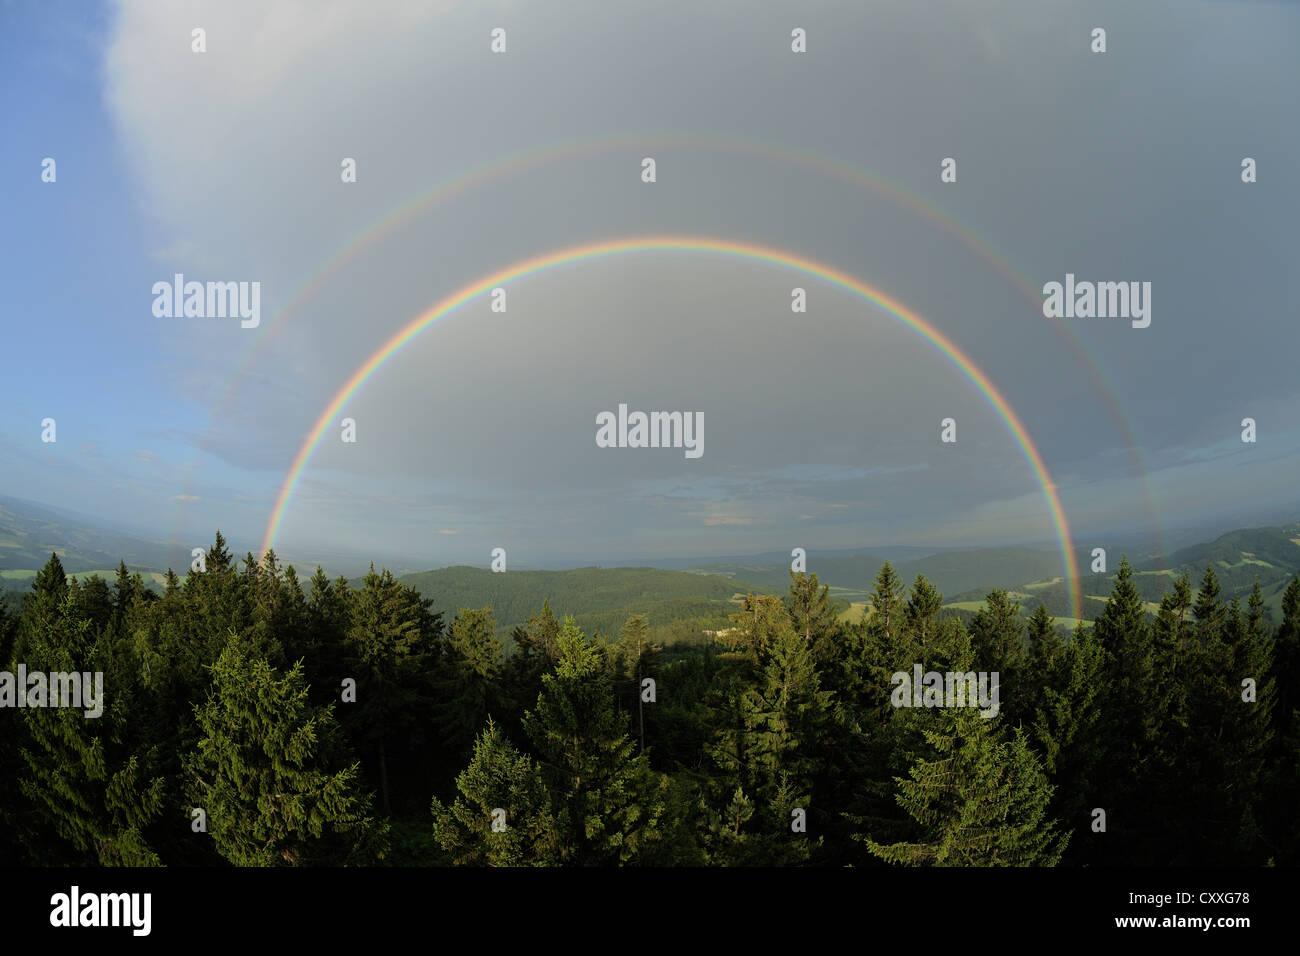 Double rainbow, view eastwards, Hutwisch viewpoint, Lower Austria, Austria, Europe - Stock Image